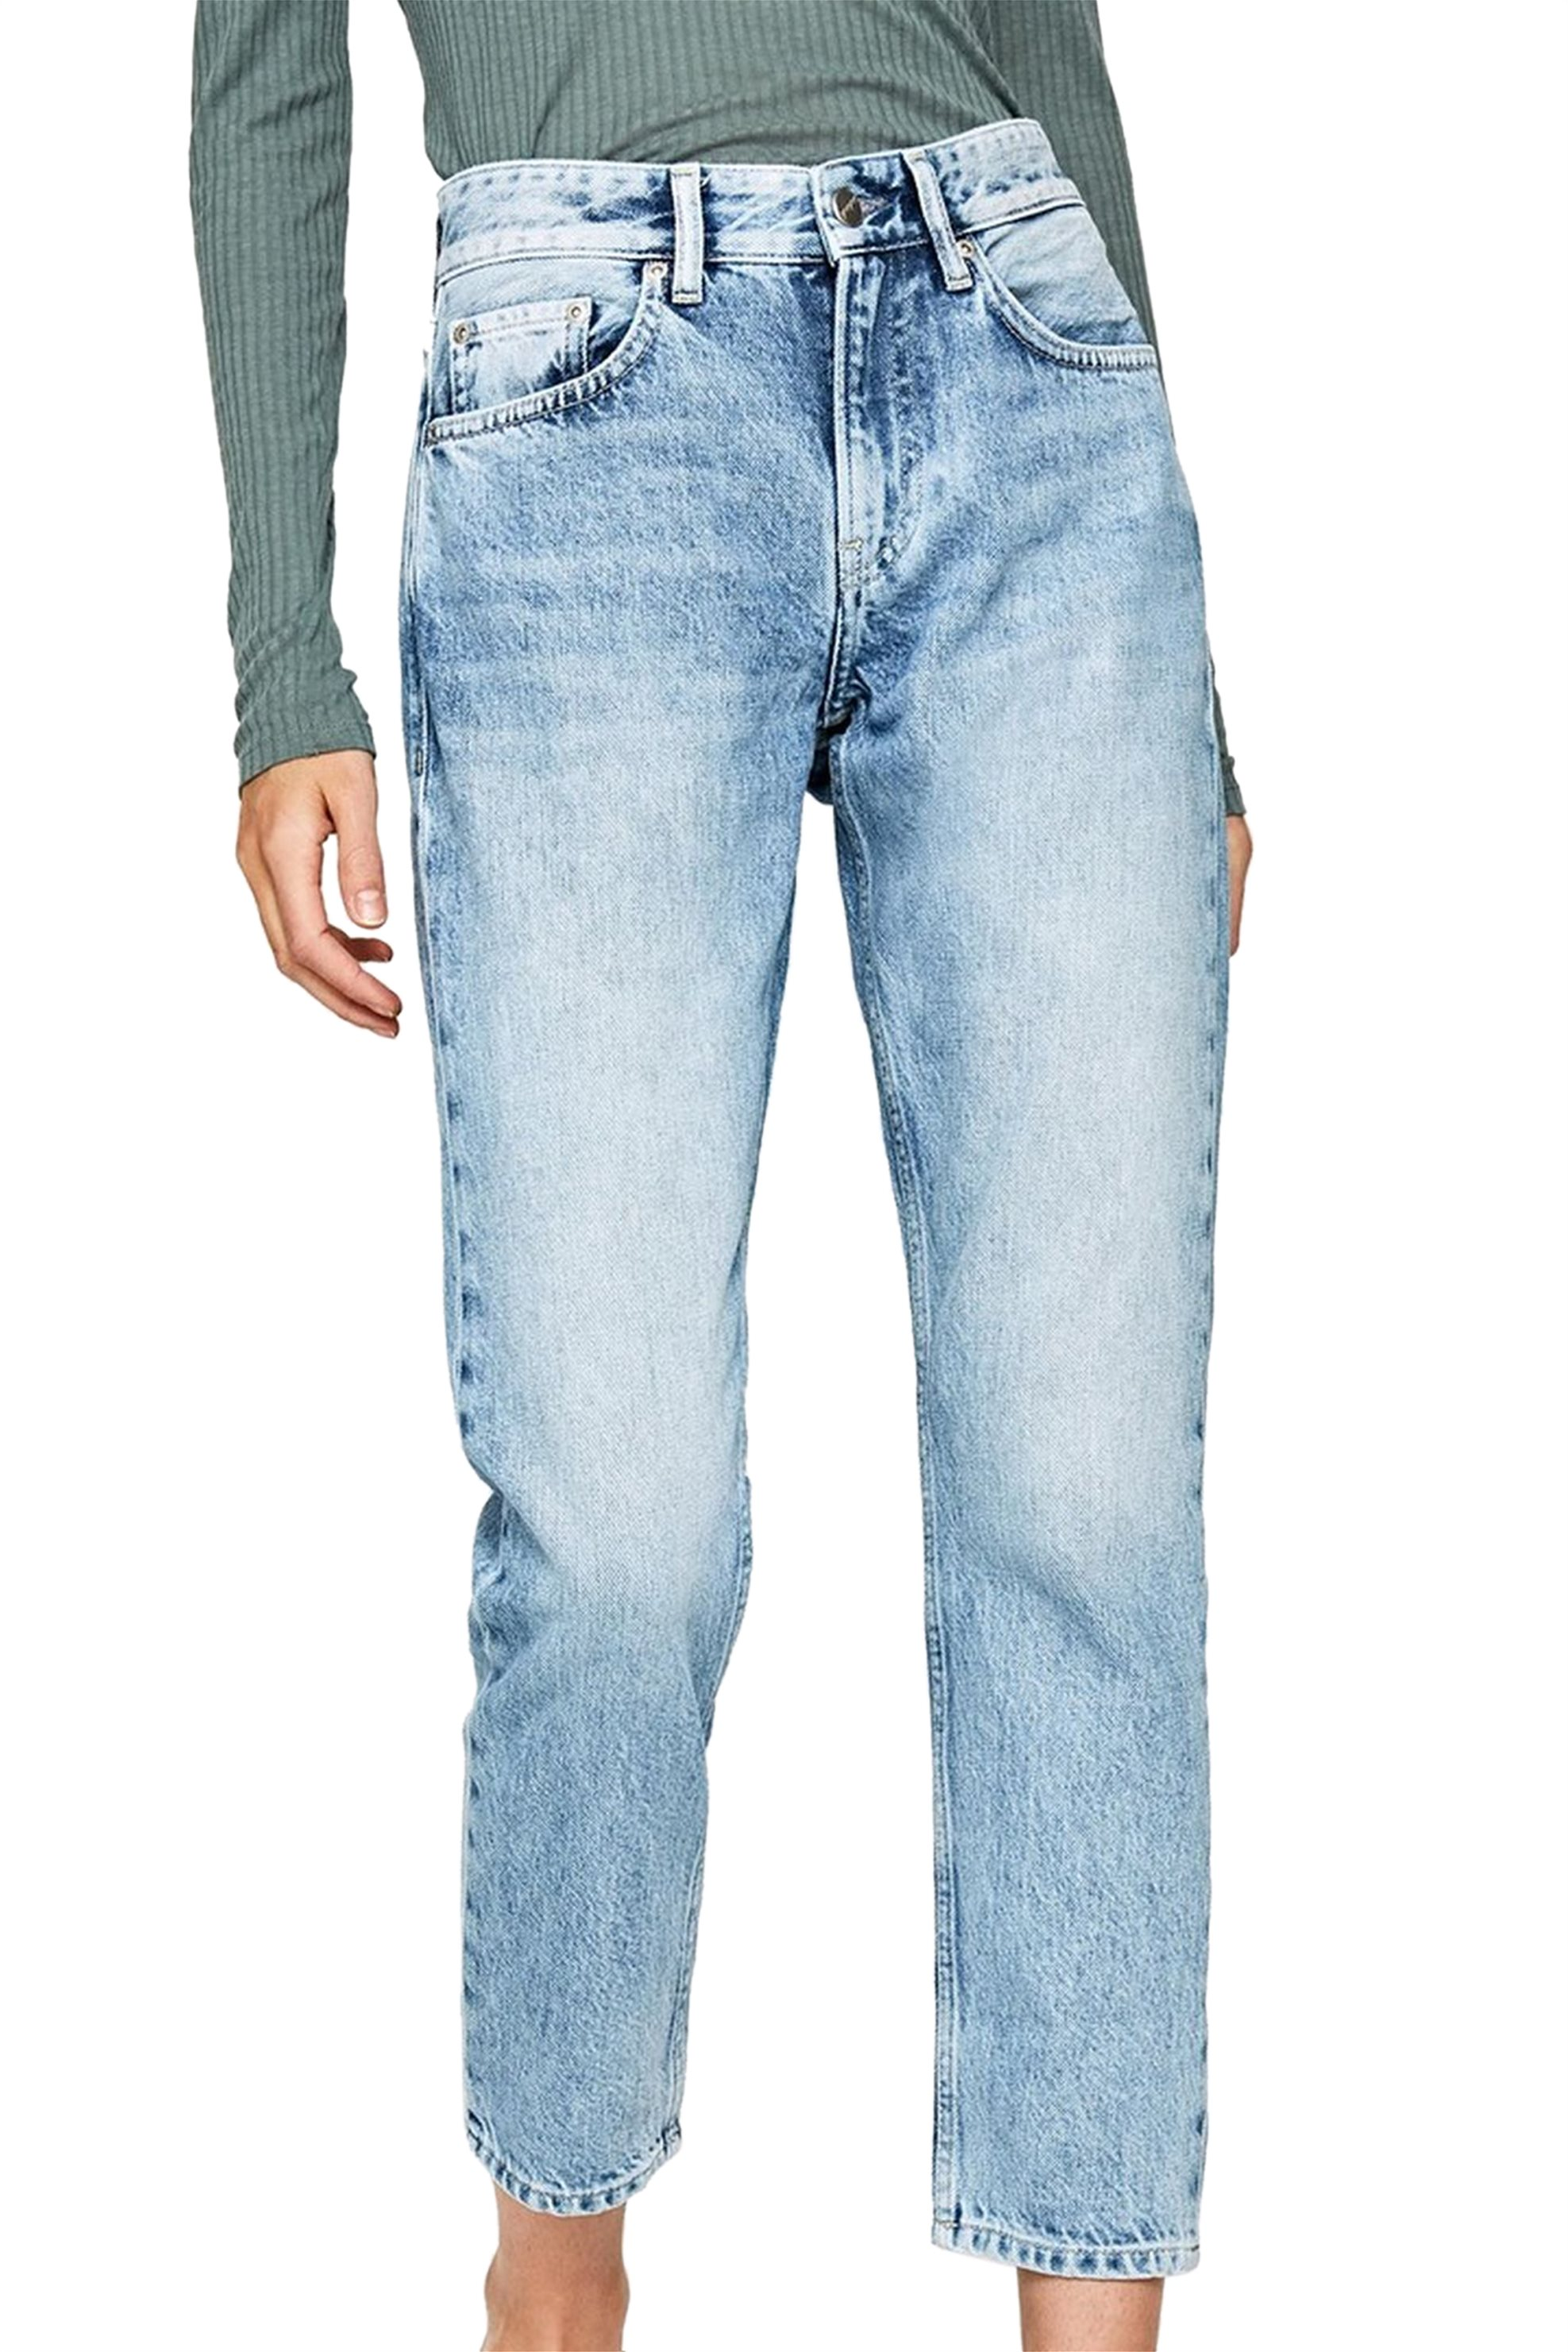 19b390b719d Cropped παντελόνι | Γυναικεία Παντελόνια | Σελίδα 5 | Snif.gr